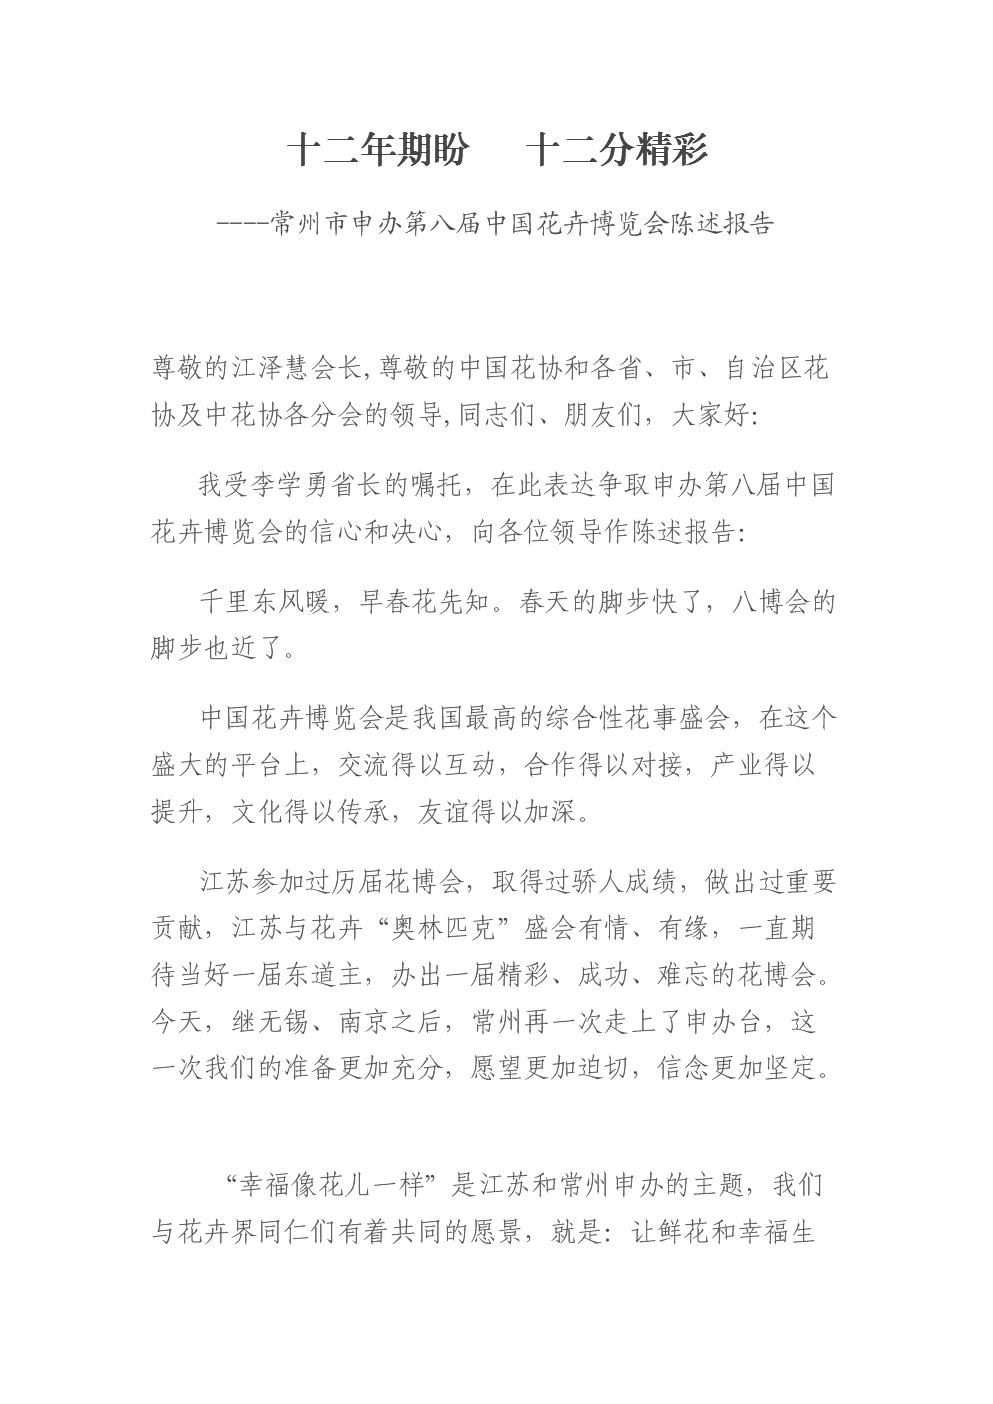 常州花博会报告.doc